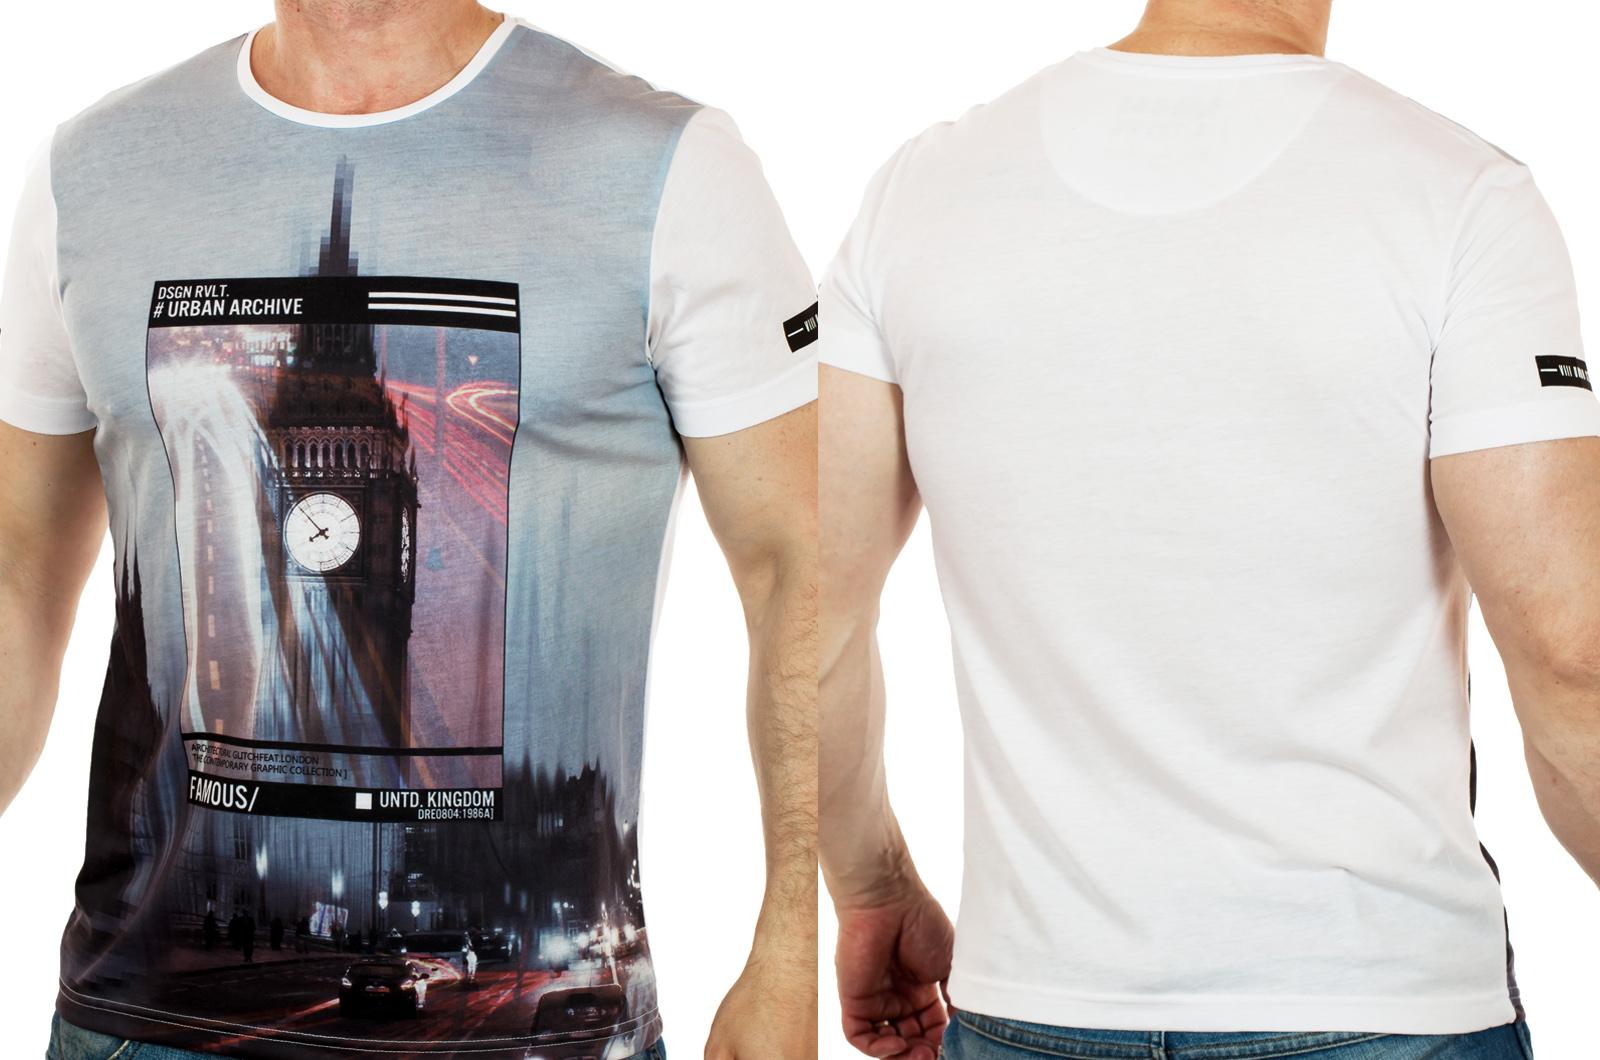 Мужская футболка из легкой ткани от ТМ Max Young Man. Комфорт и стиль без компромиссов